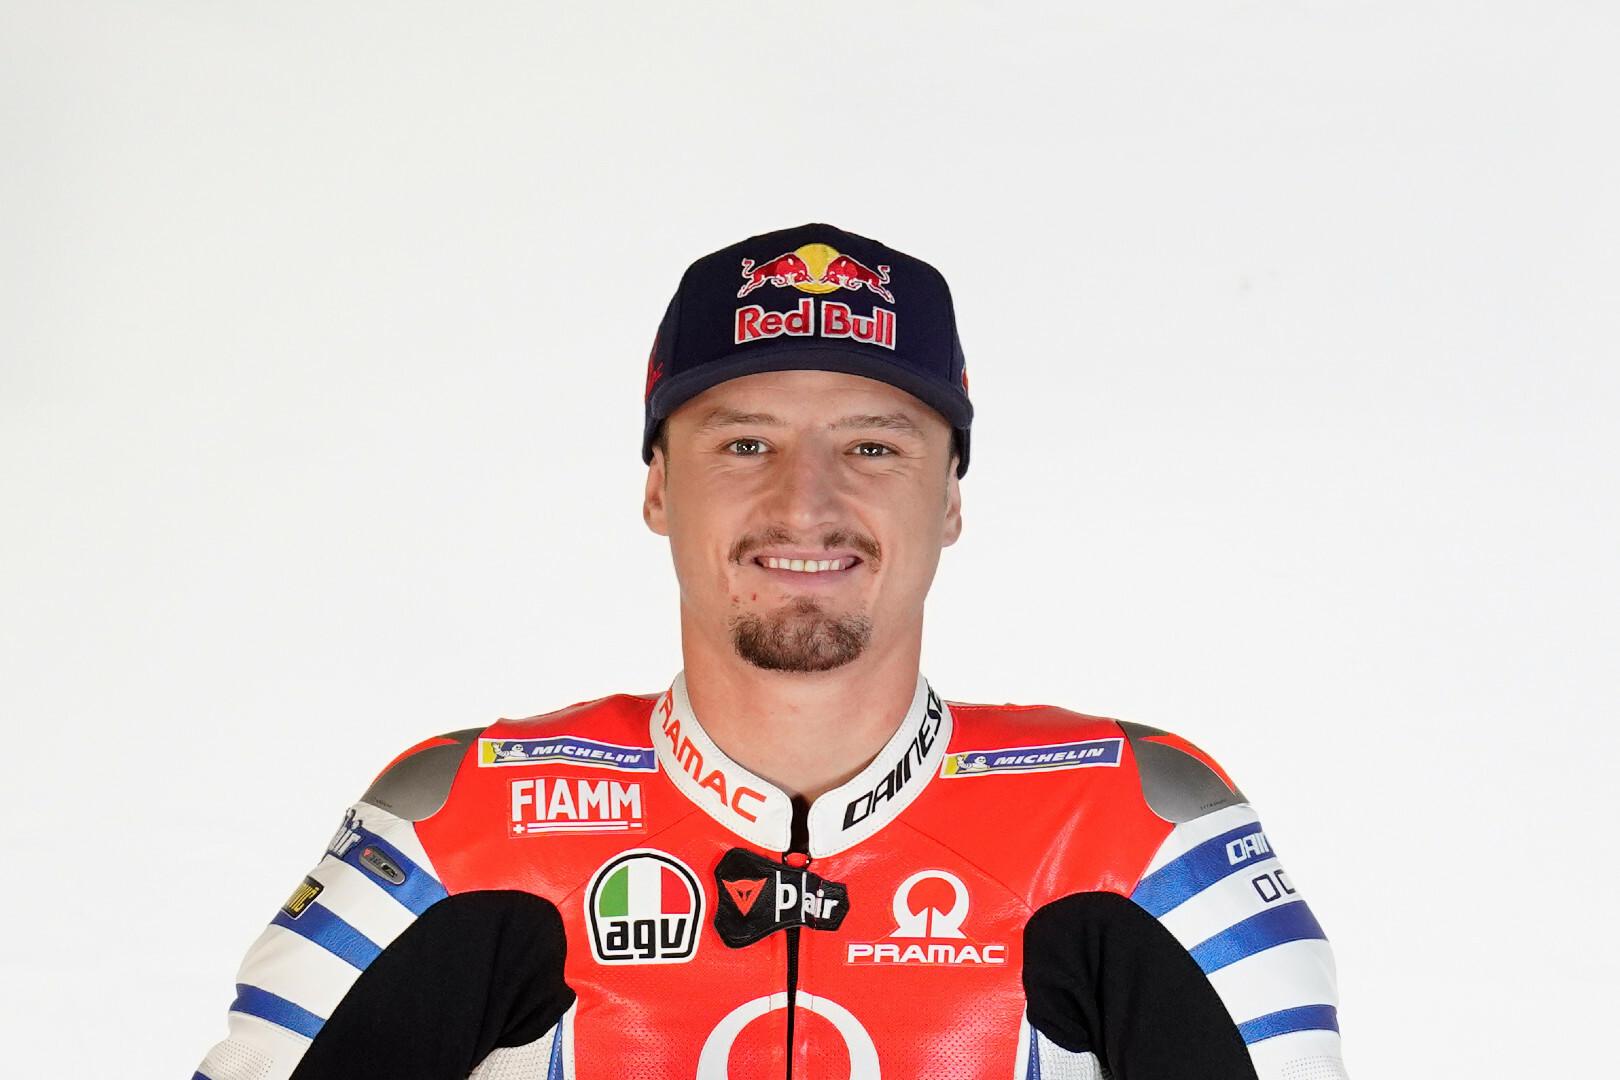 Oficial: Jack Miller firma con Ducati para 2021